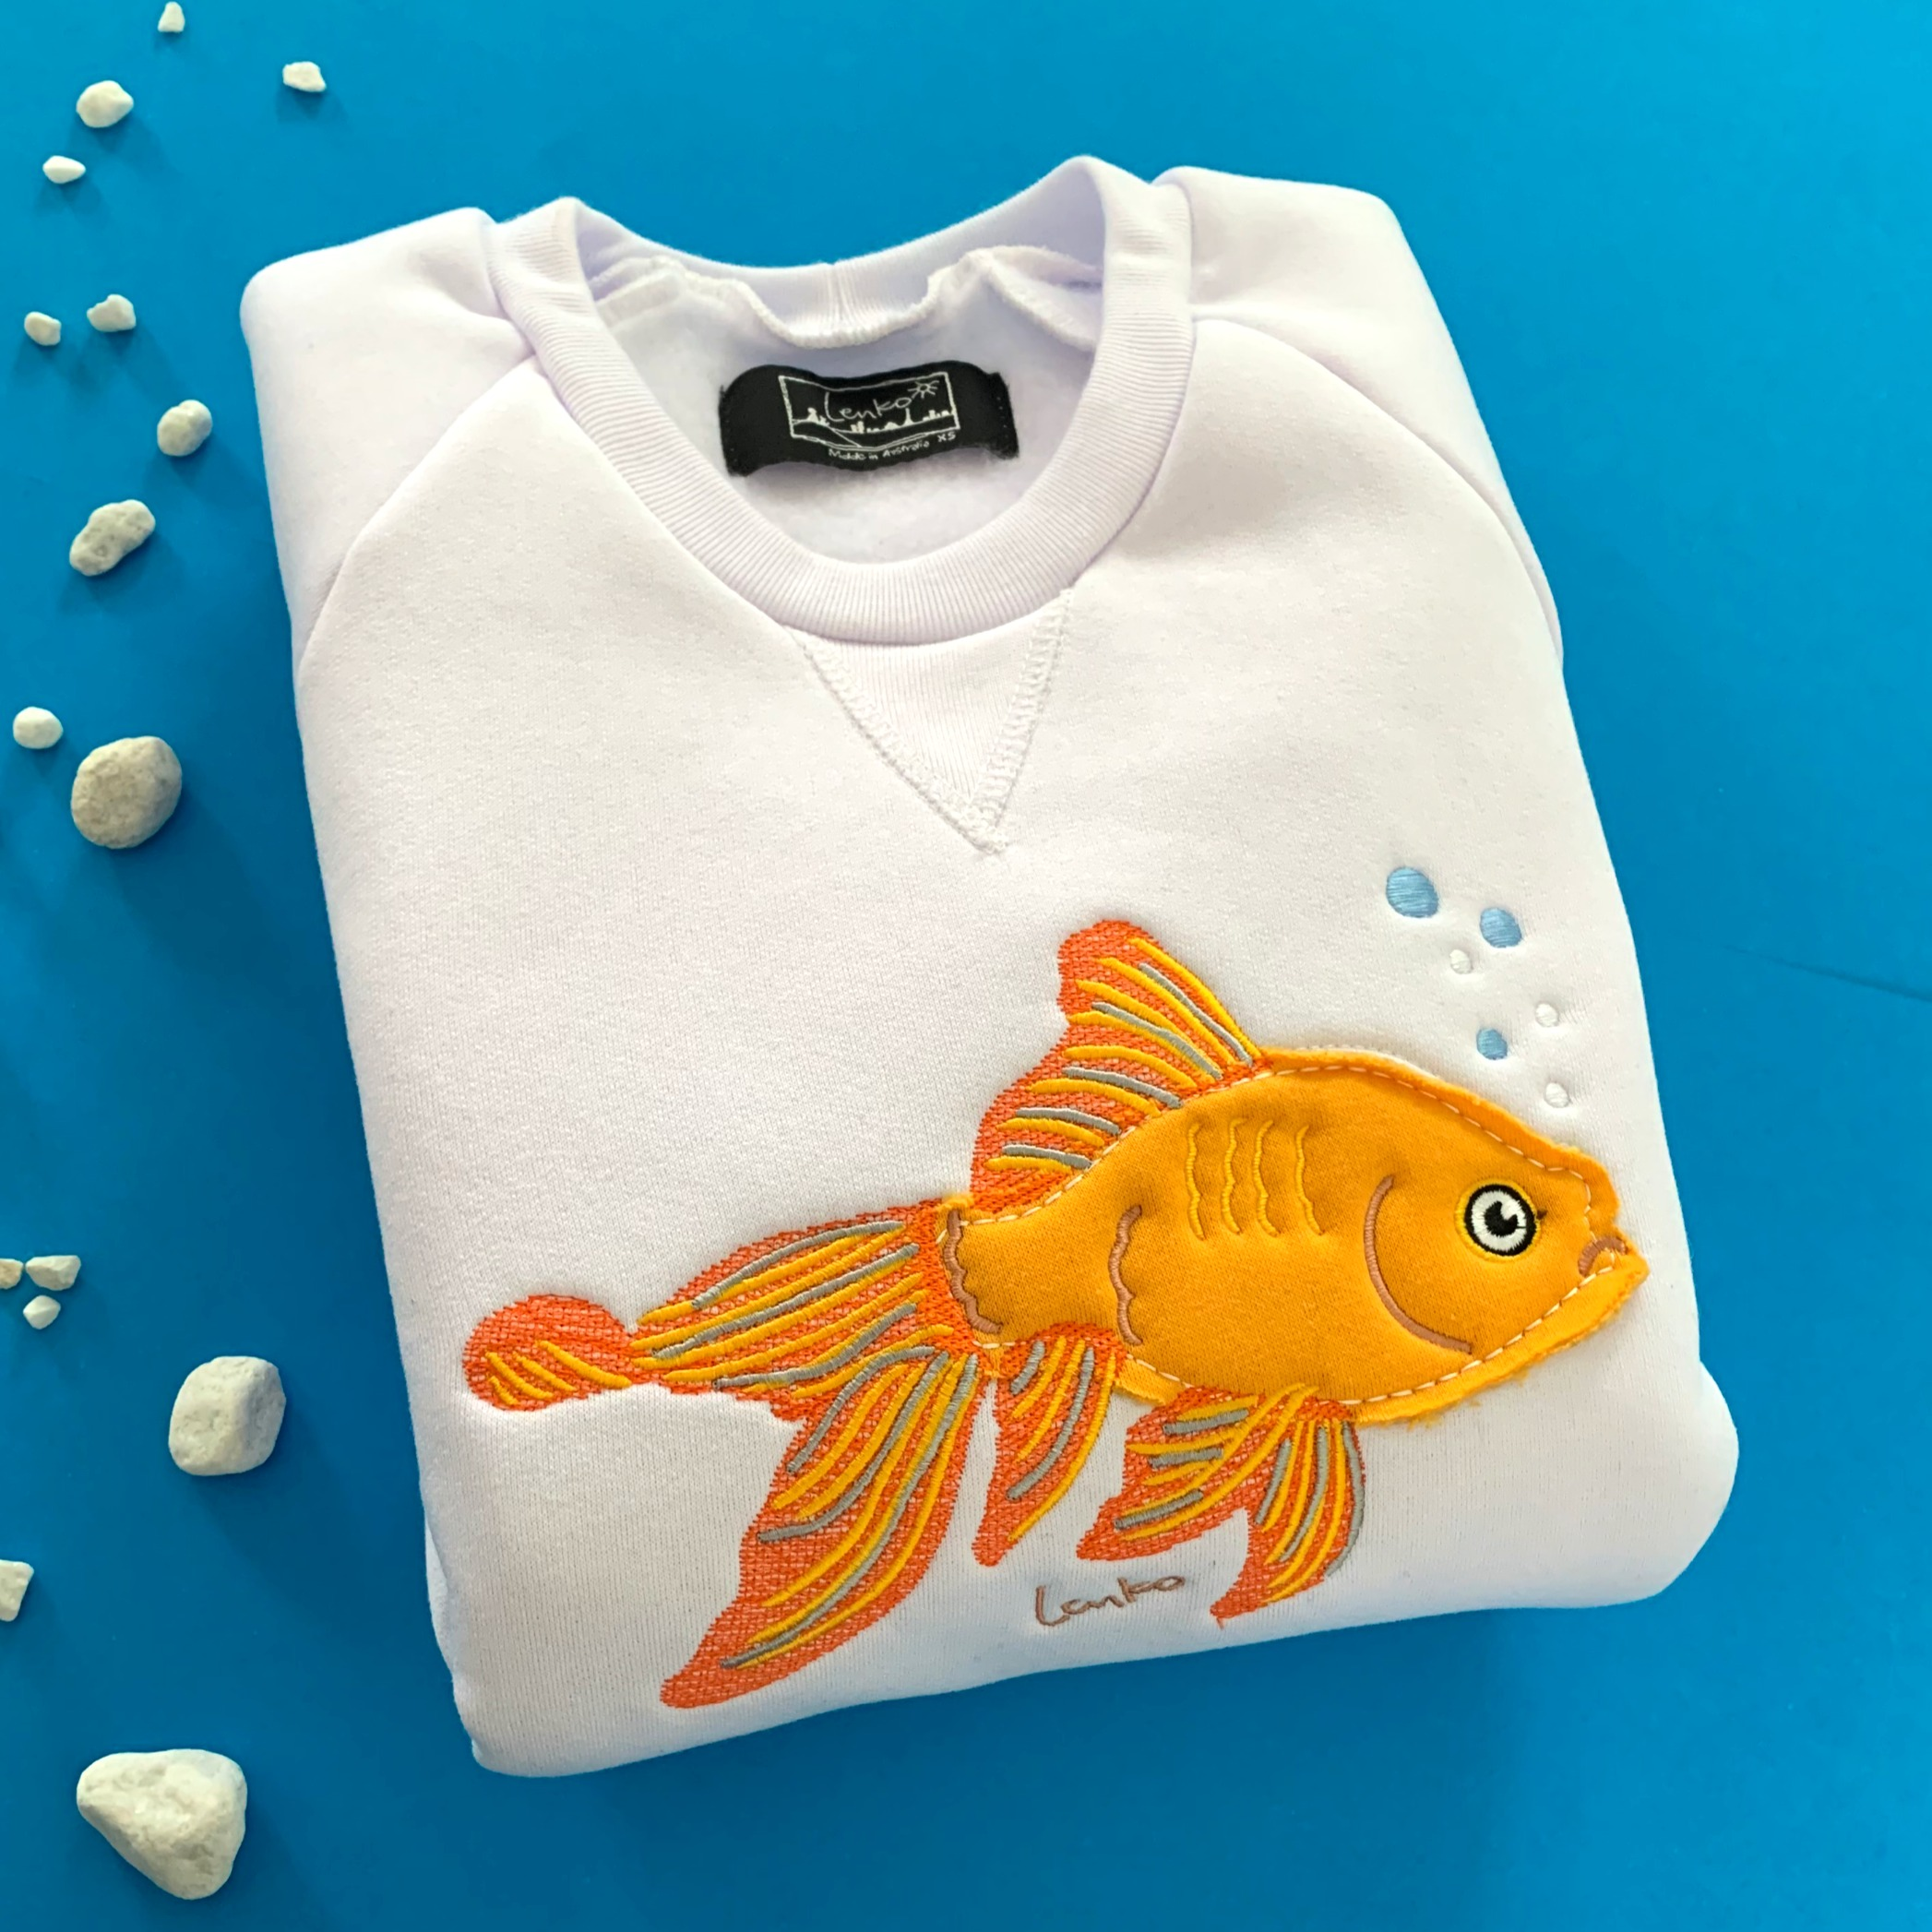 2020 - Goldfish